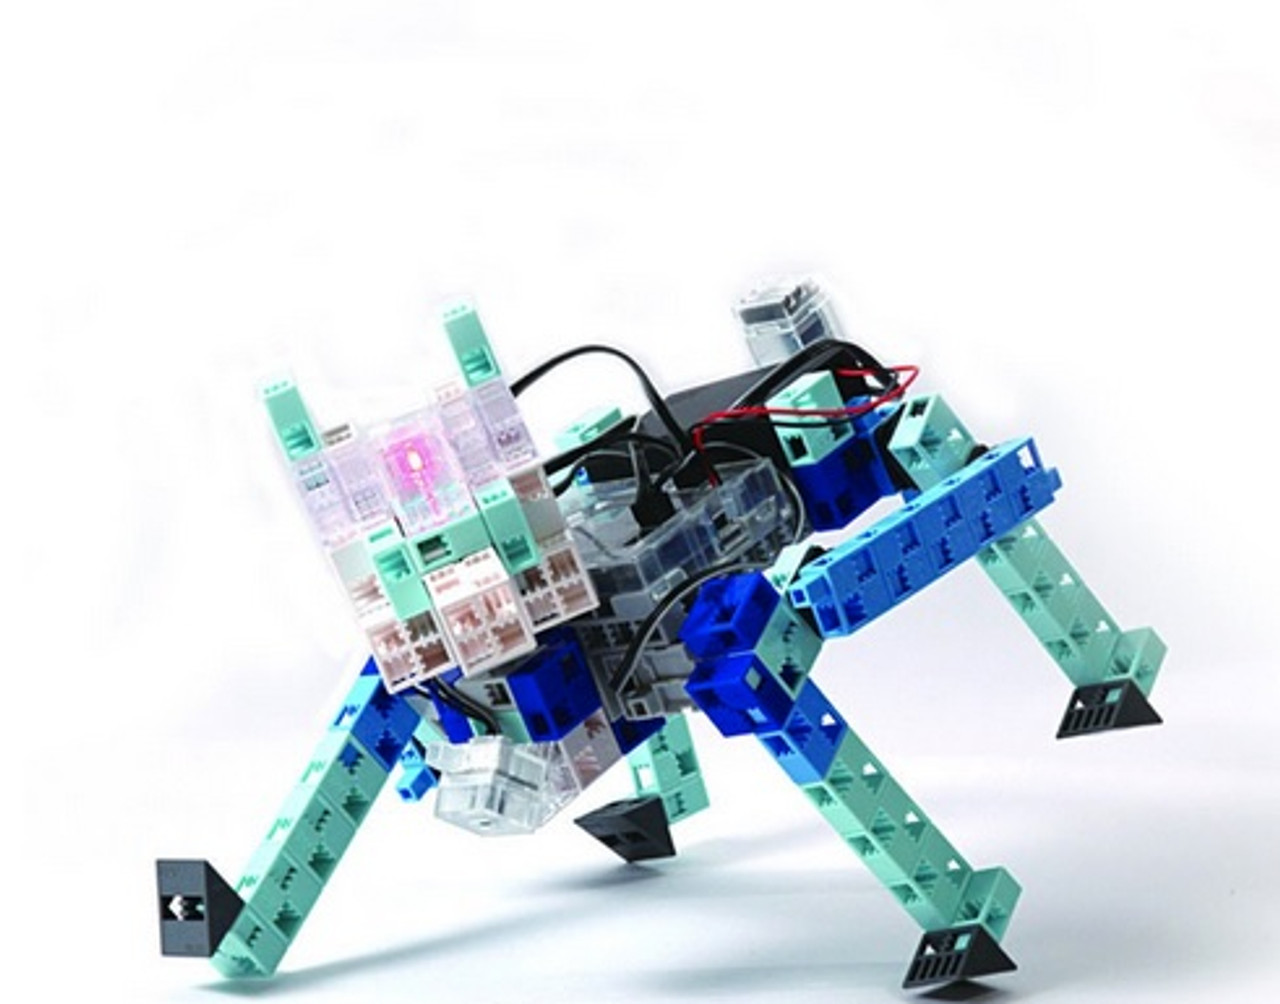 Artec, Blocks, Robotist, Educational, Transforming, Robot, Car, Toy, Building, Kit, 153210,